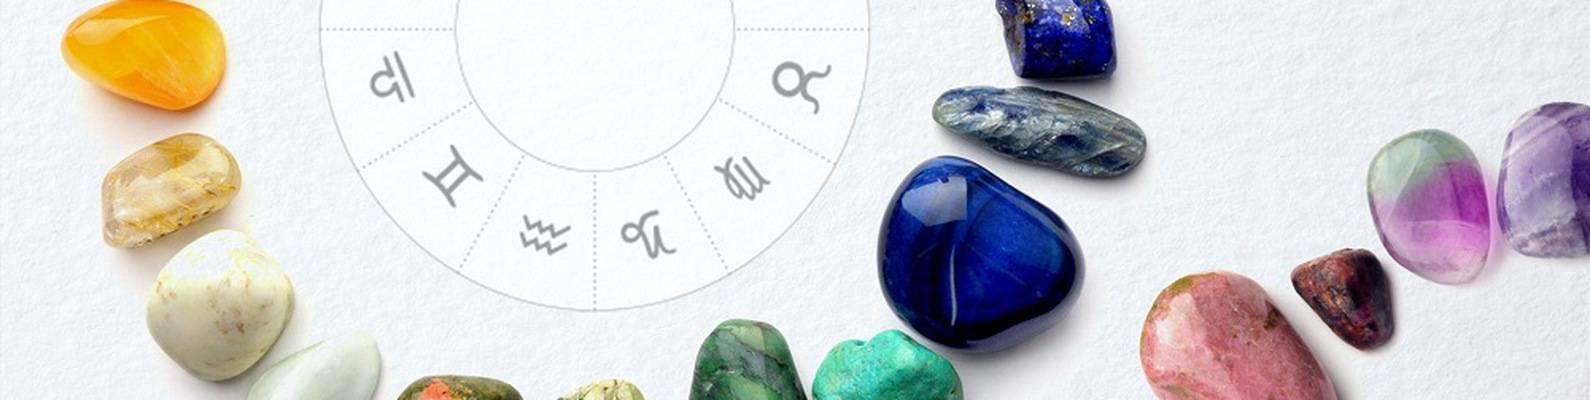 Камни по знаку зодиака по дате рождения от сглаза и порчи: влияние имени на правильный выбор